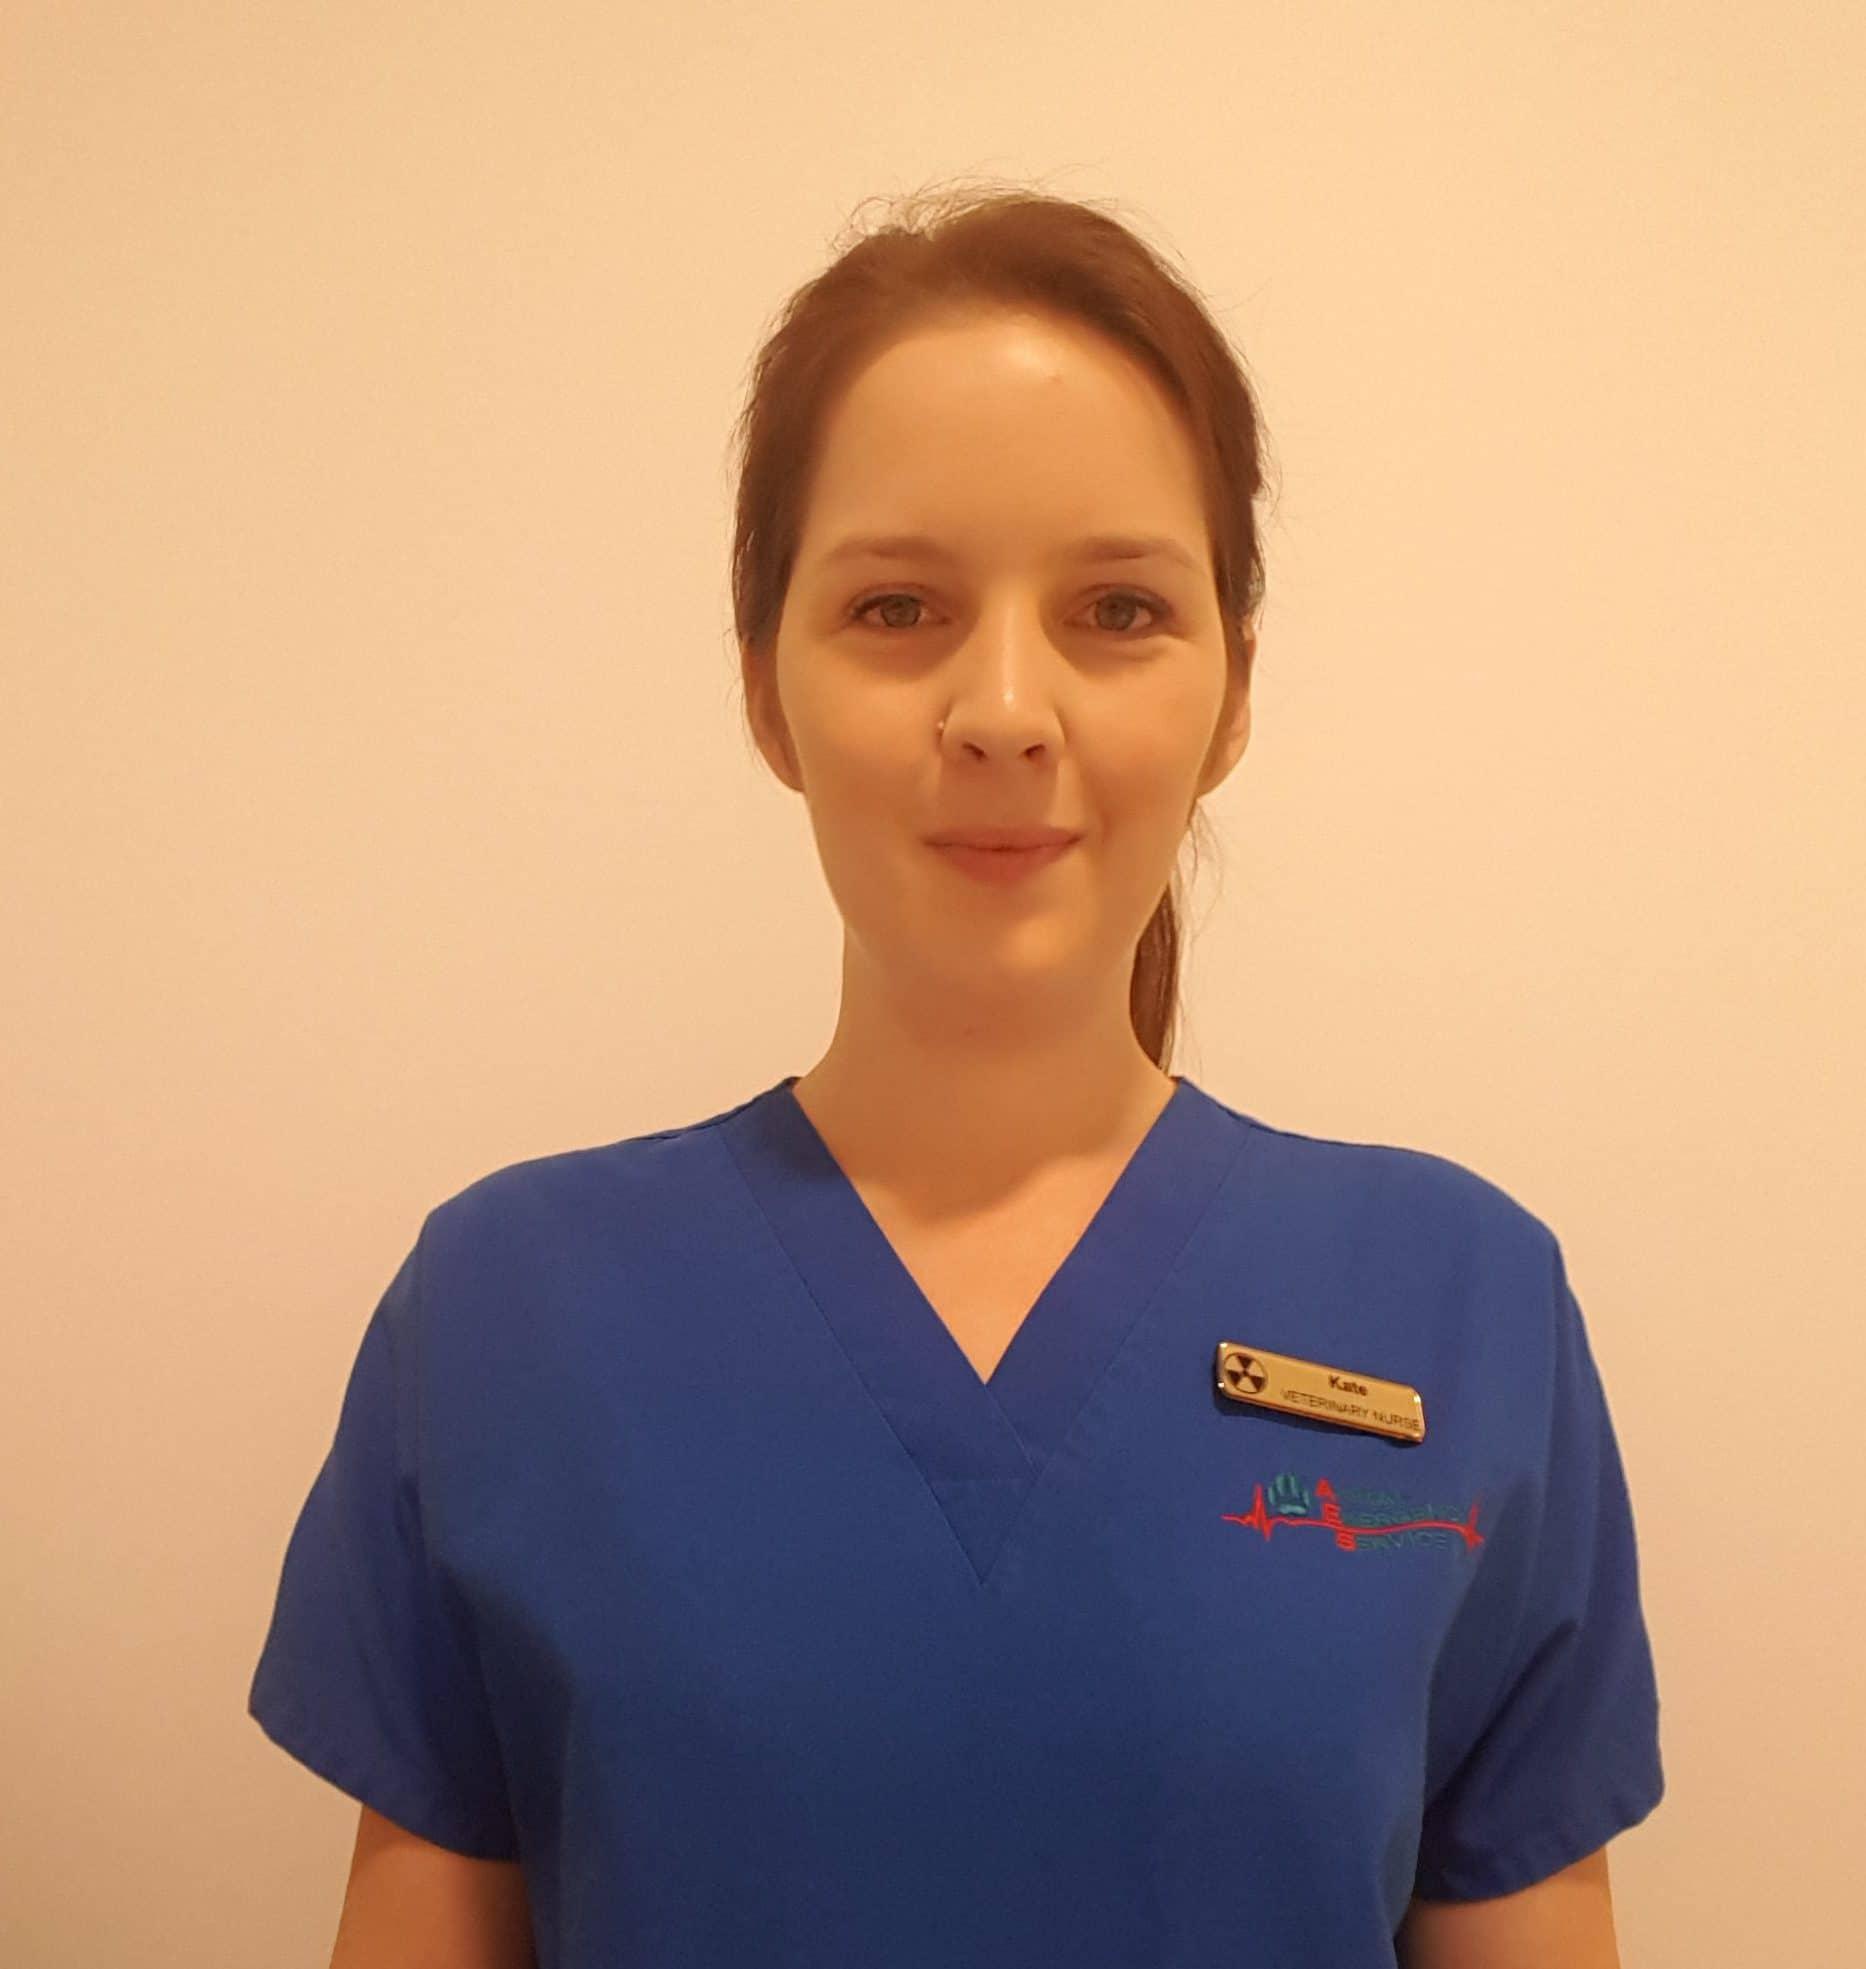 Animal Emergency Service Nurse, Kate Wesche